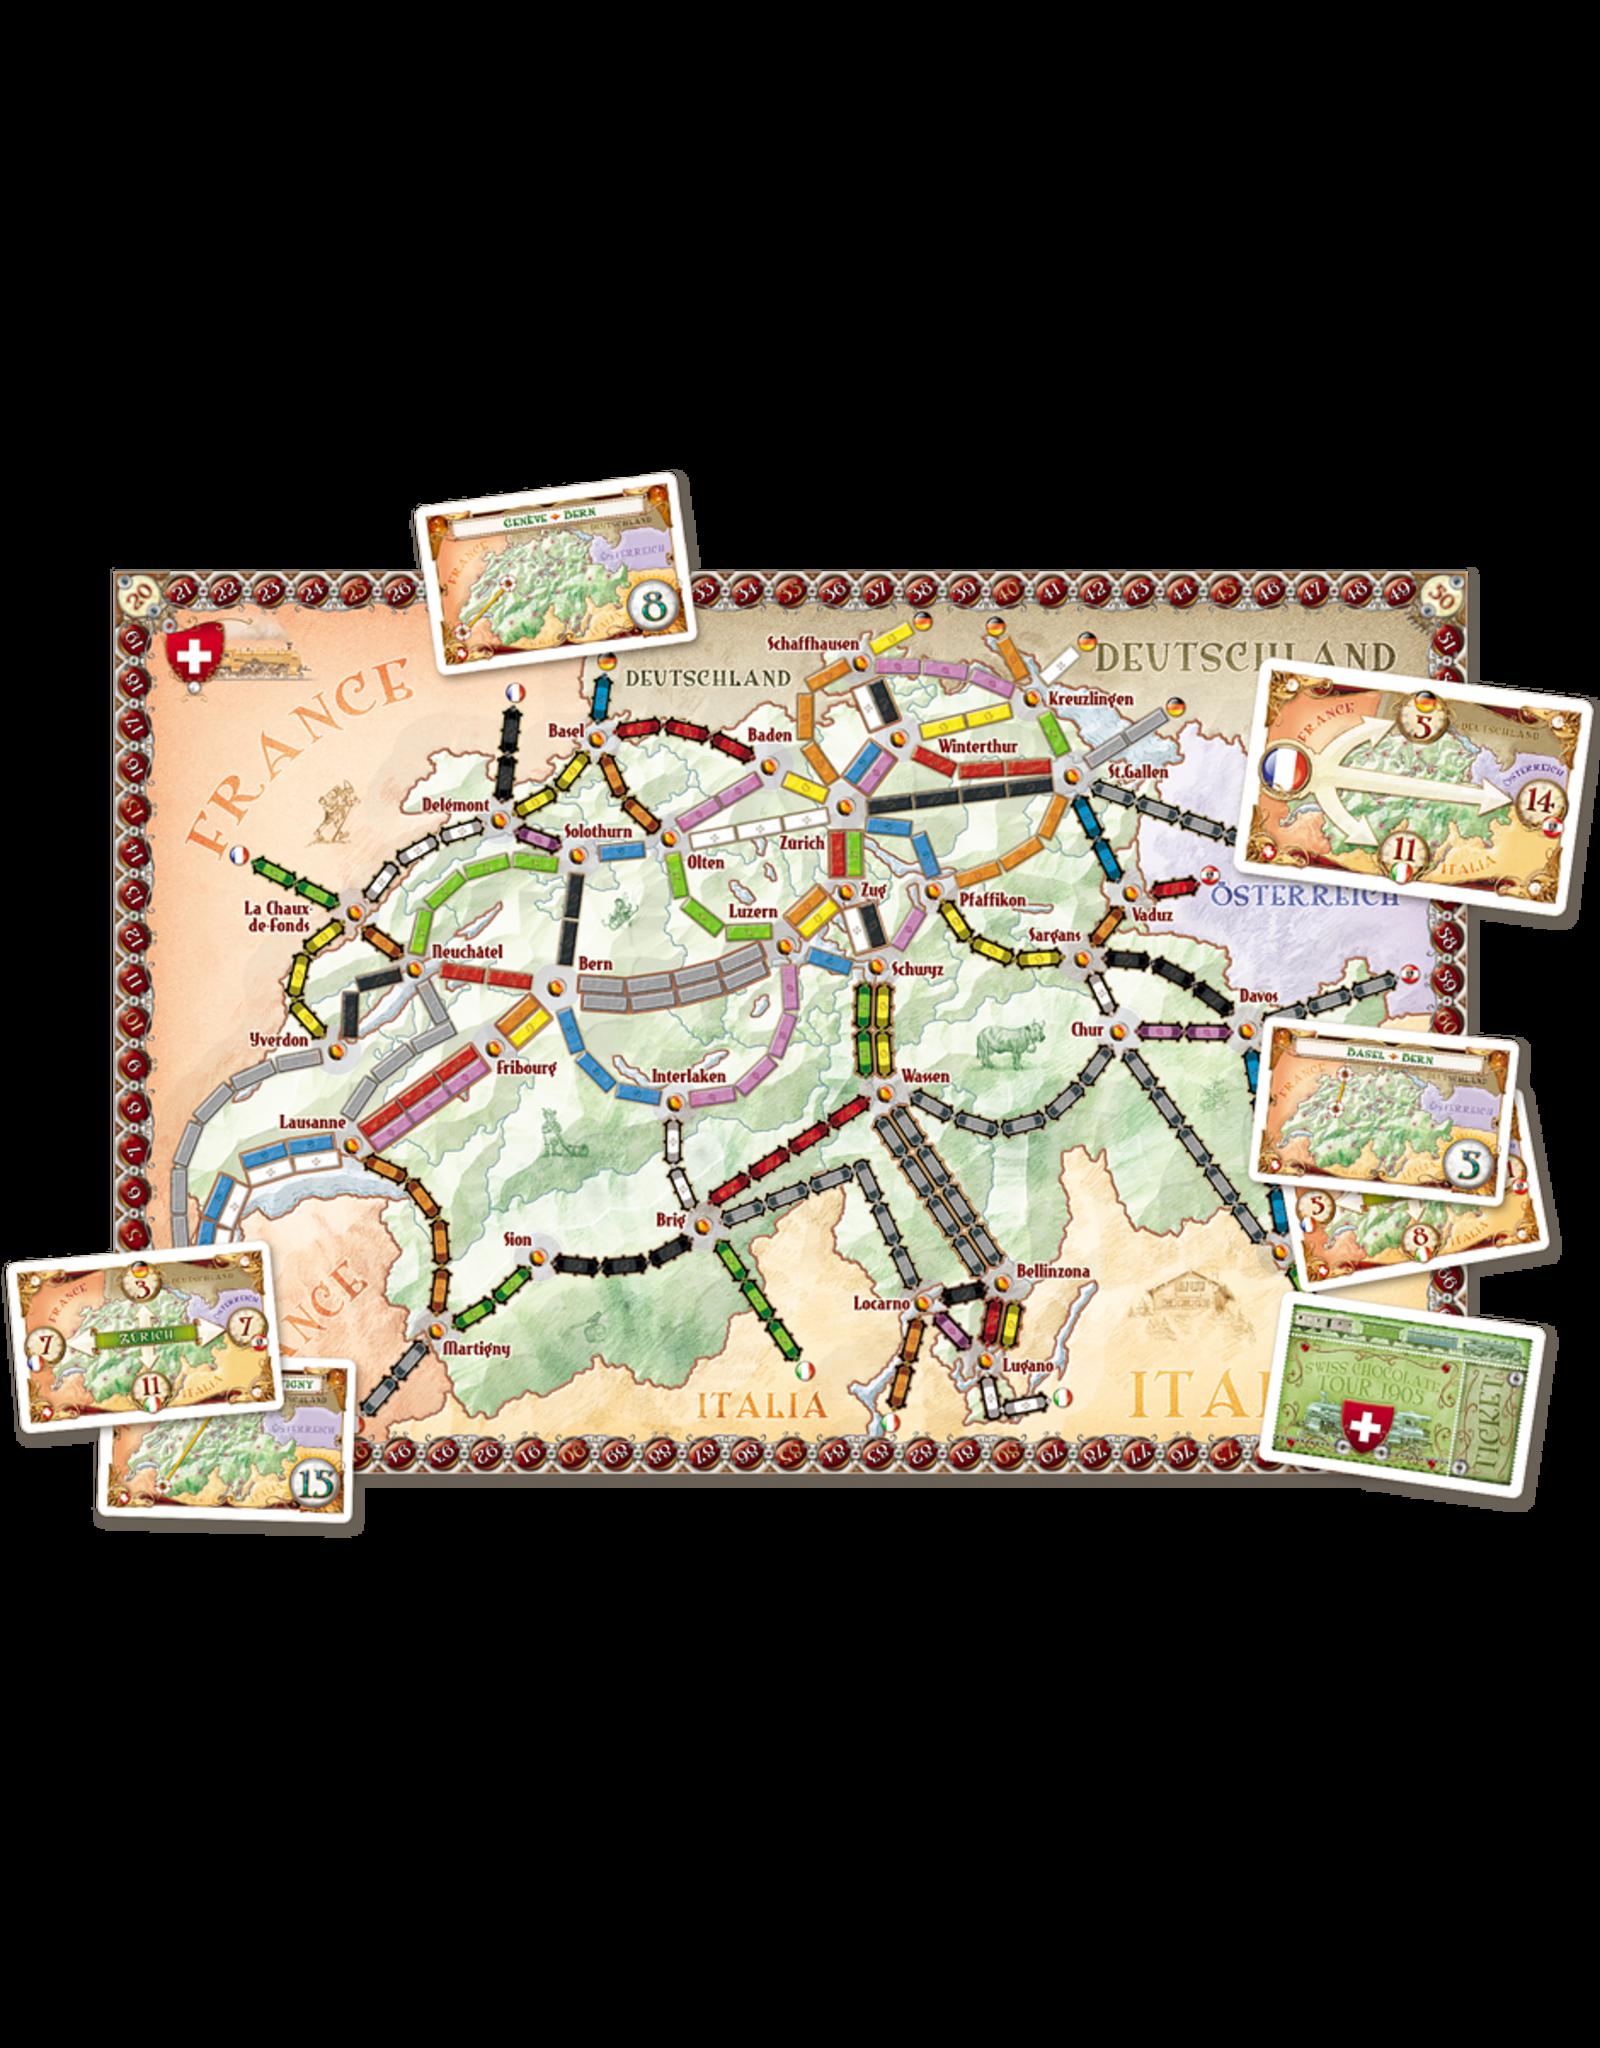 Days of Wonder Ticket to Ride Map 2 India & Switzerland